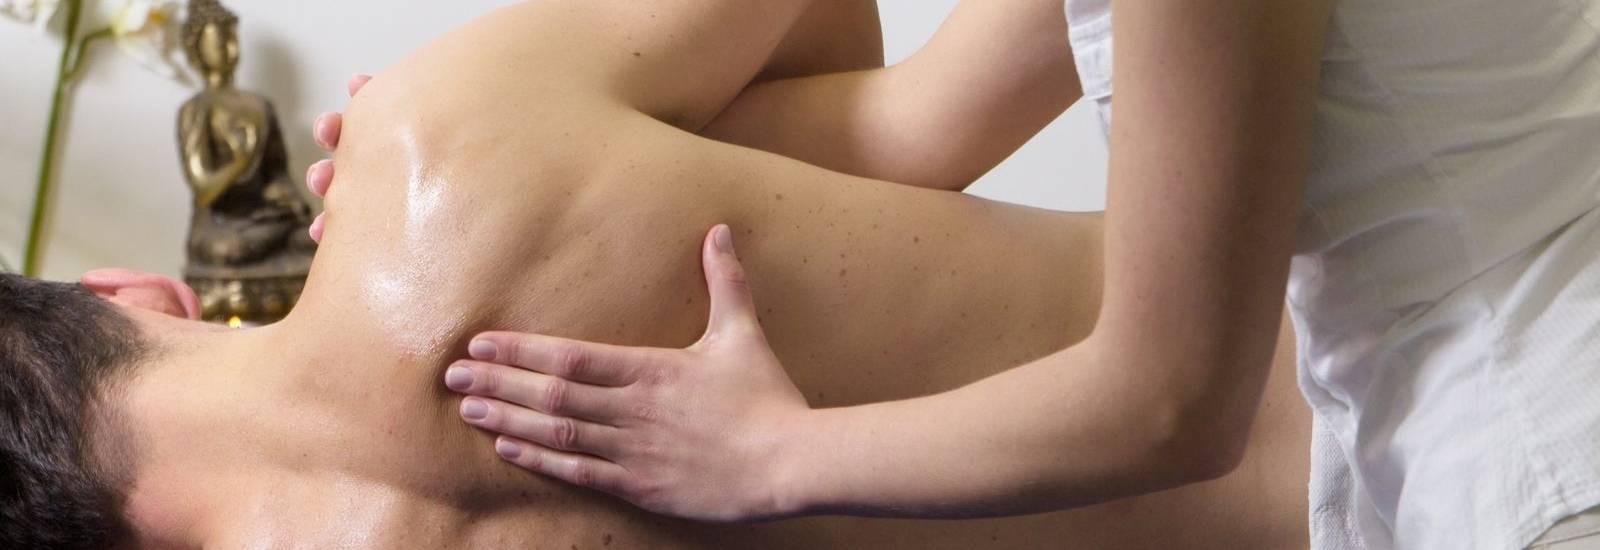 massage side lying t spine.jpg